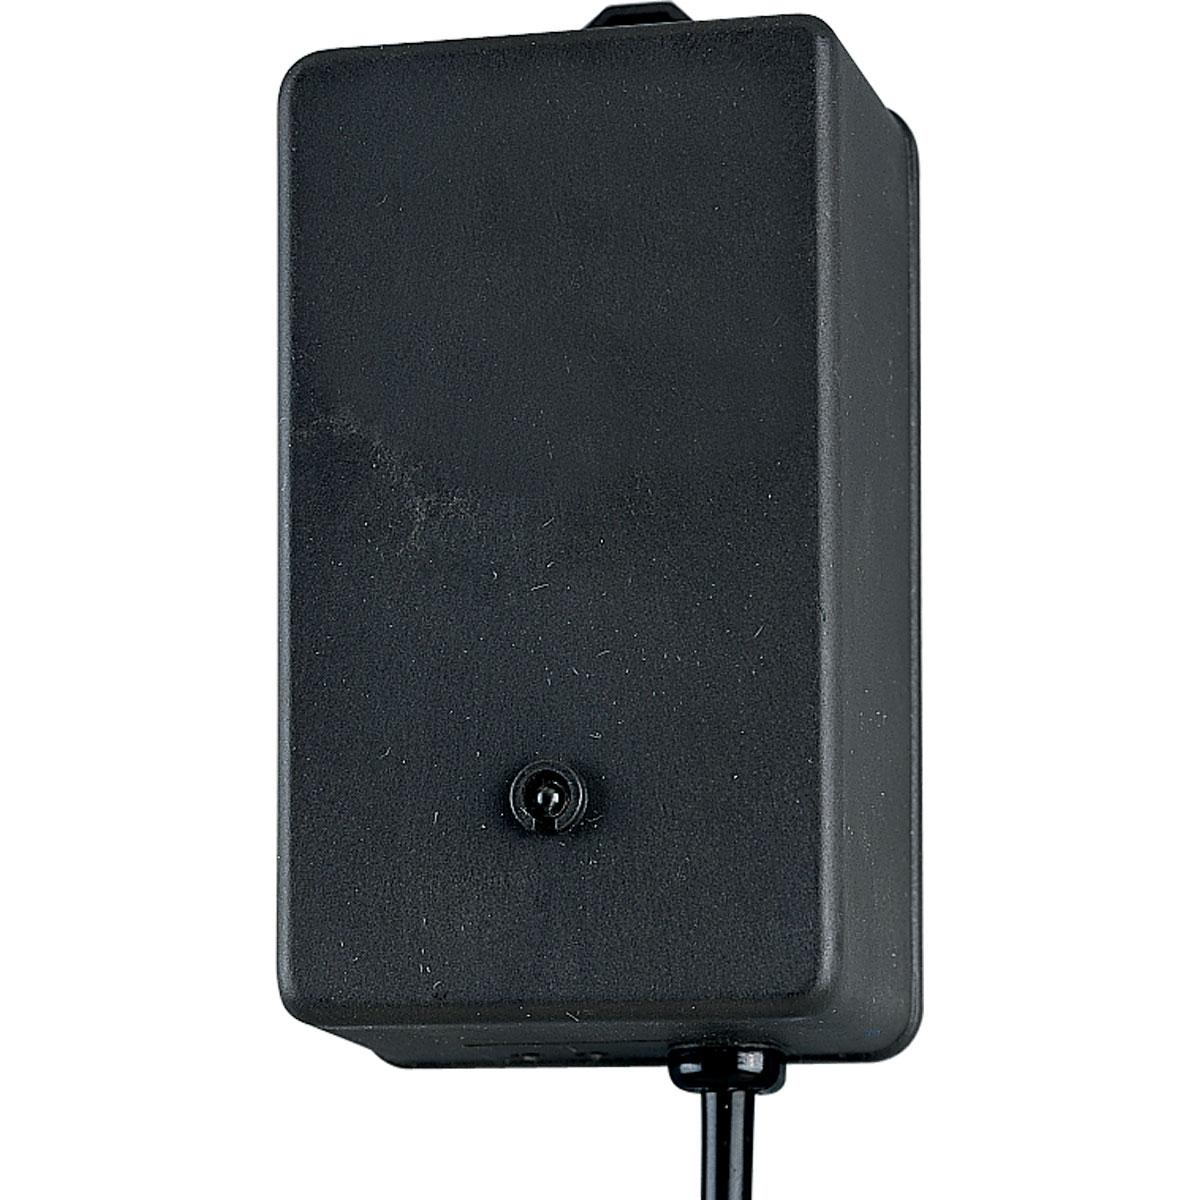 Progress Lighting® P8517-31 Commodity/Utilitarian Electronic Landscape Transformer, 120 VAC Input, 12 VAC Output, 150 W